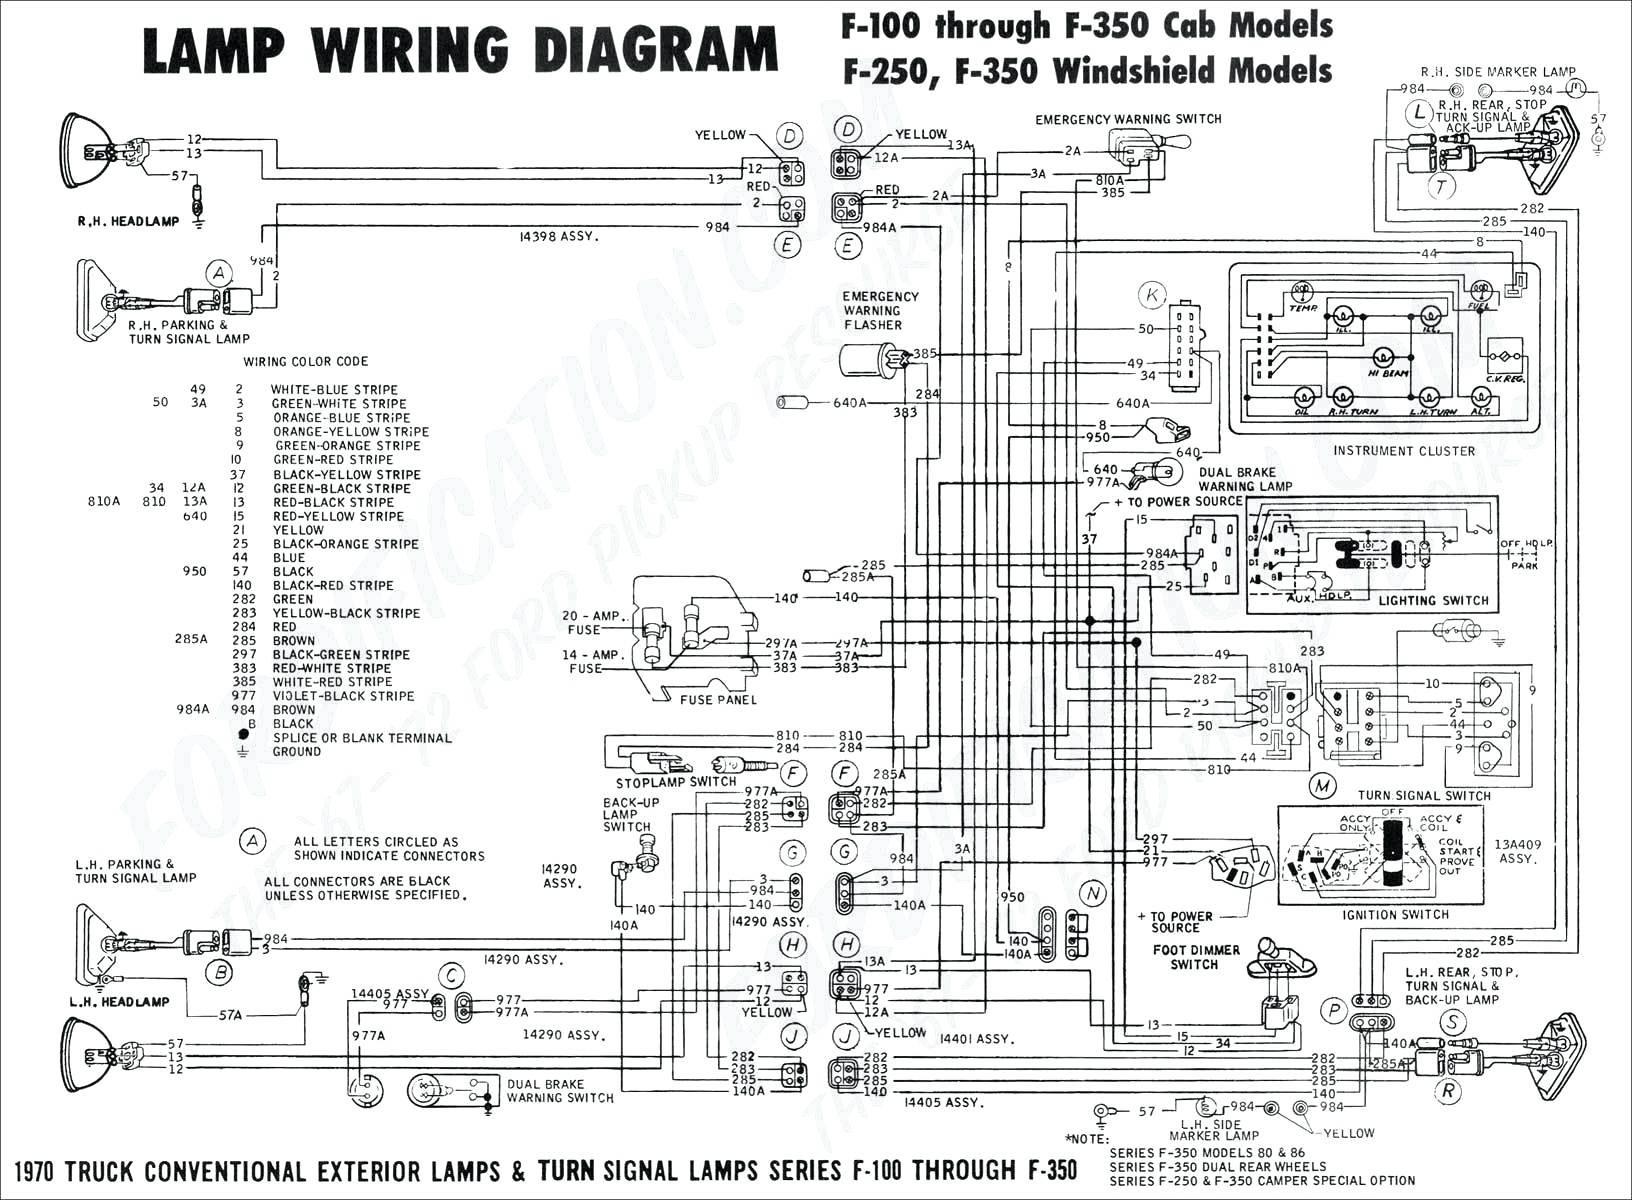 91 Honda Accord Engine Diagram 1991 Honda Accord Radio Wiring Diagram Best Also Honda Civic